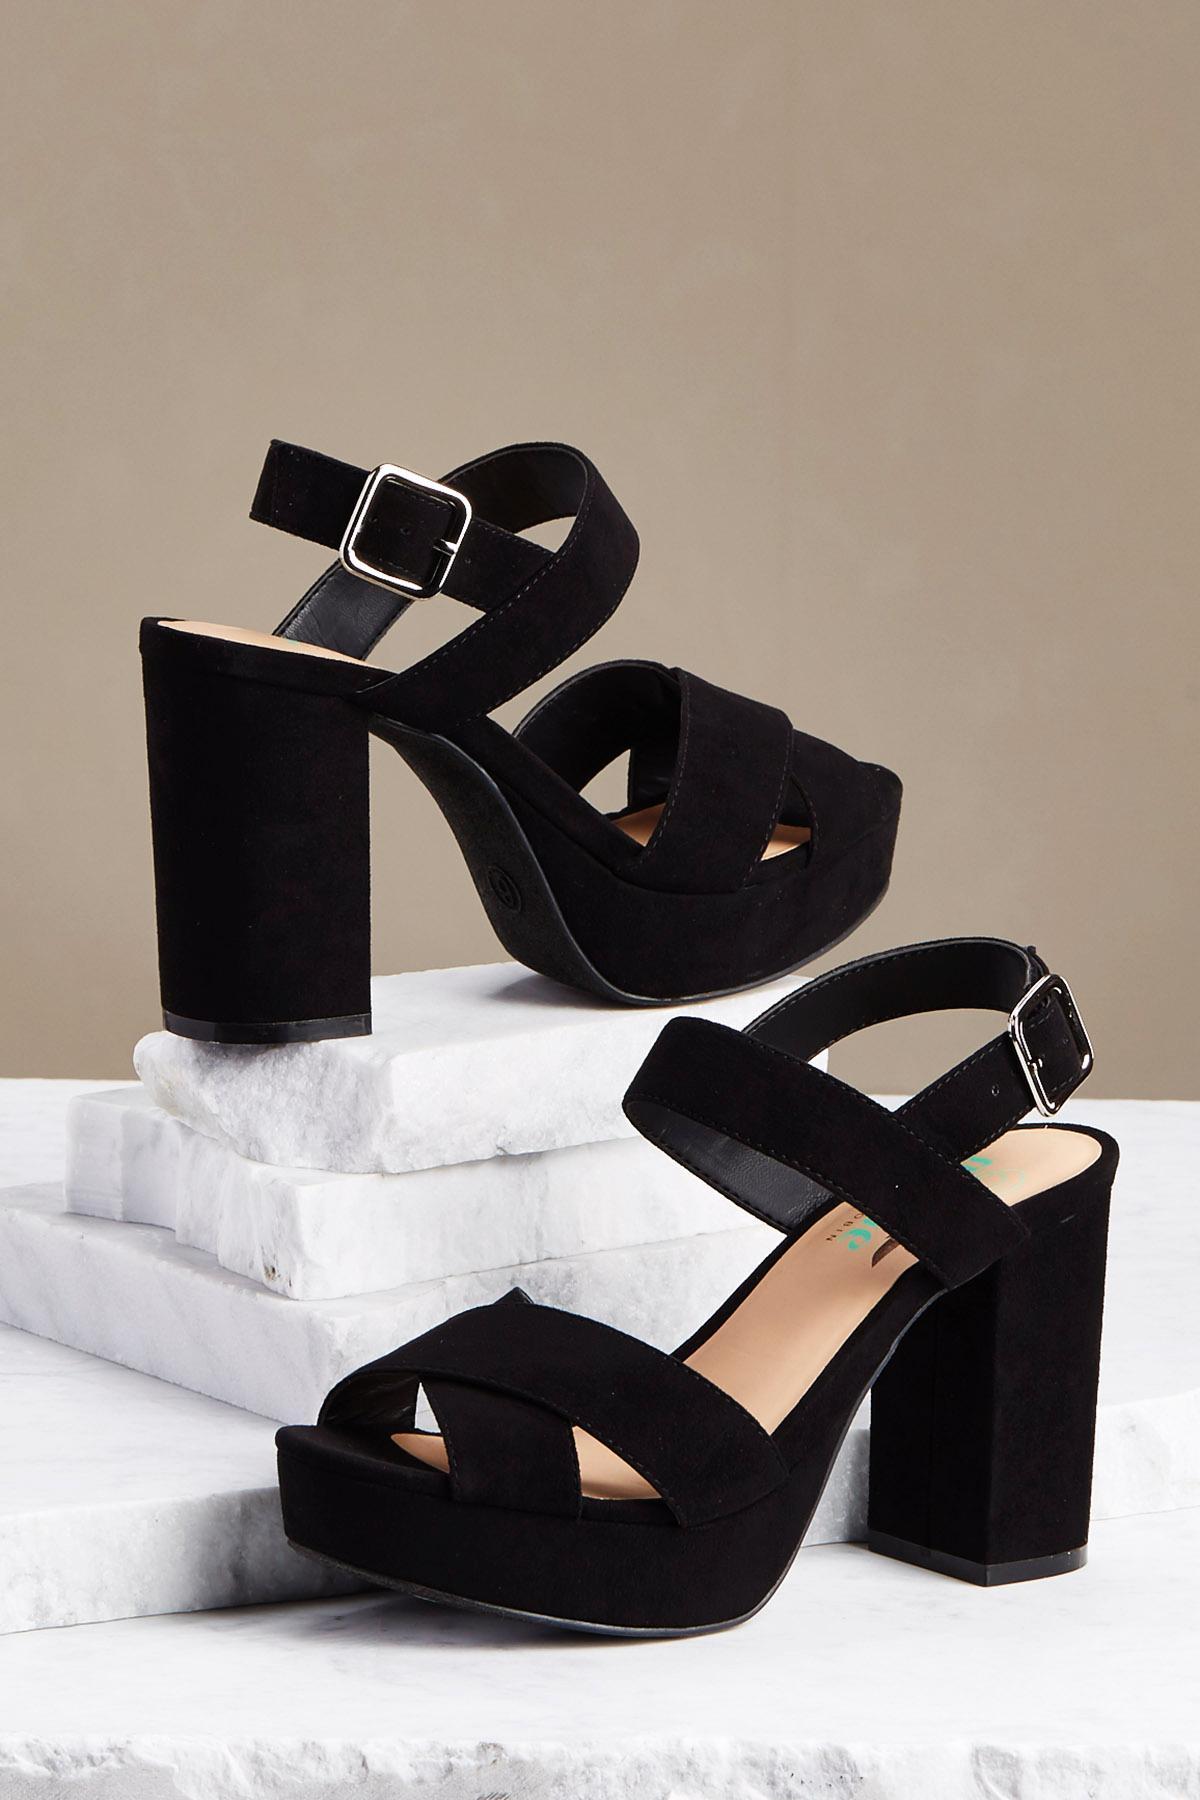 Criss Cross Strap Block Heels